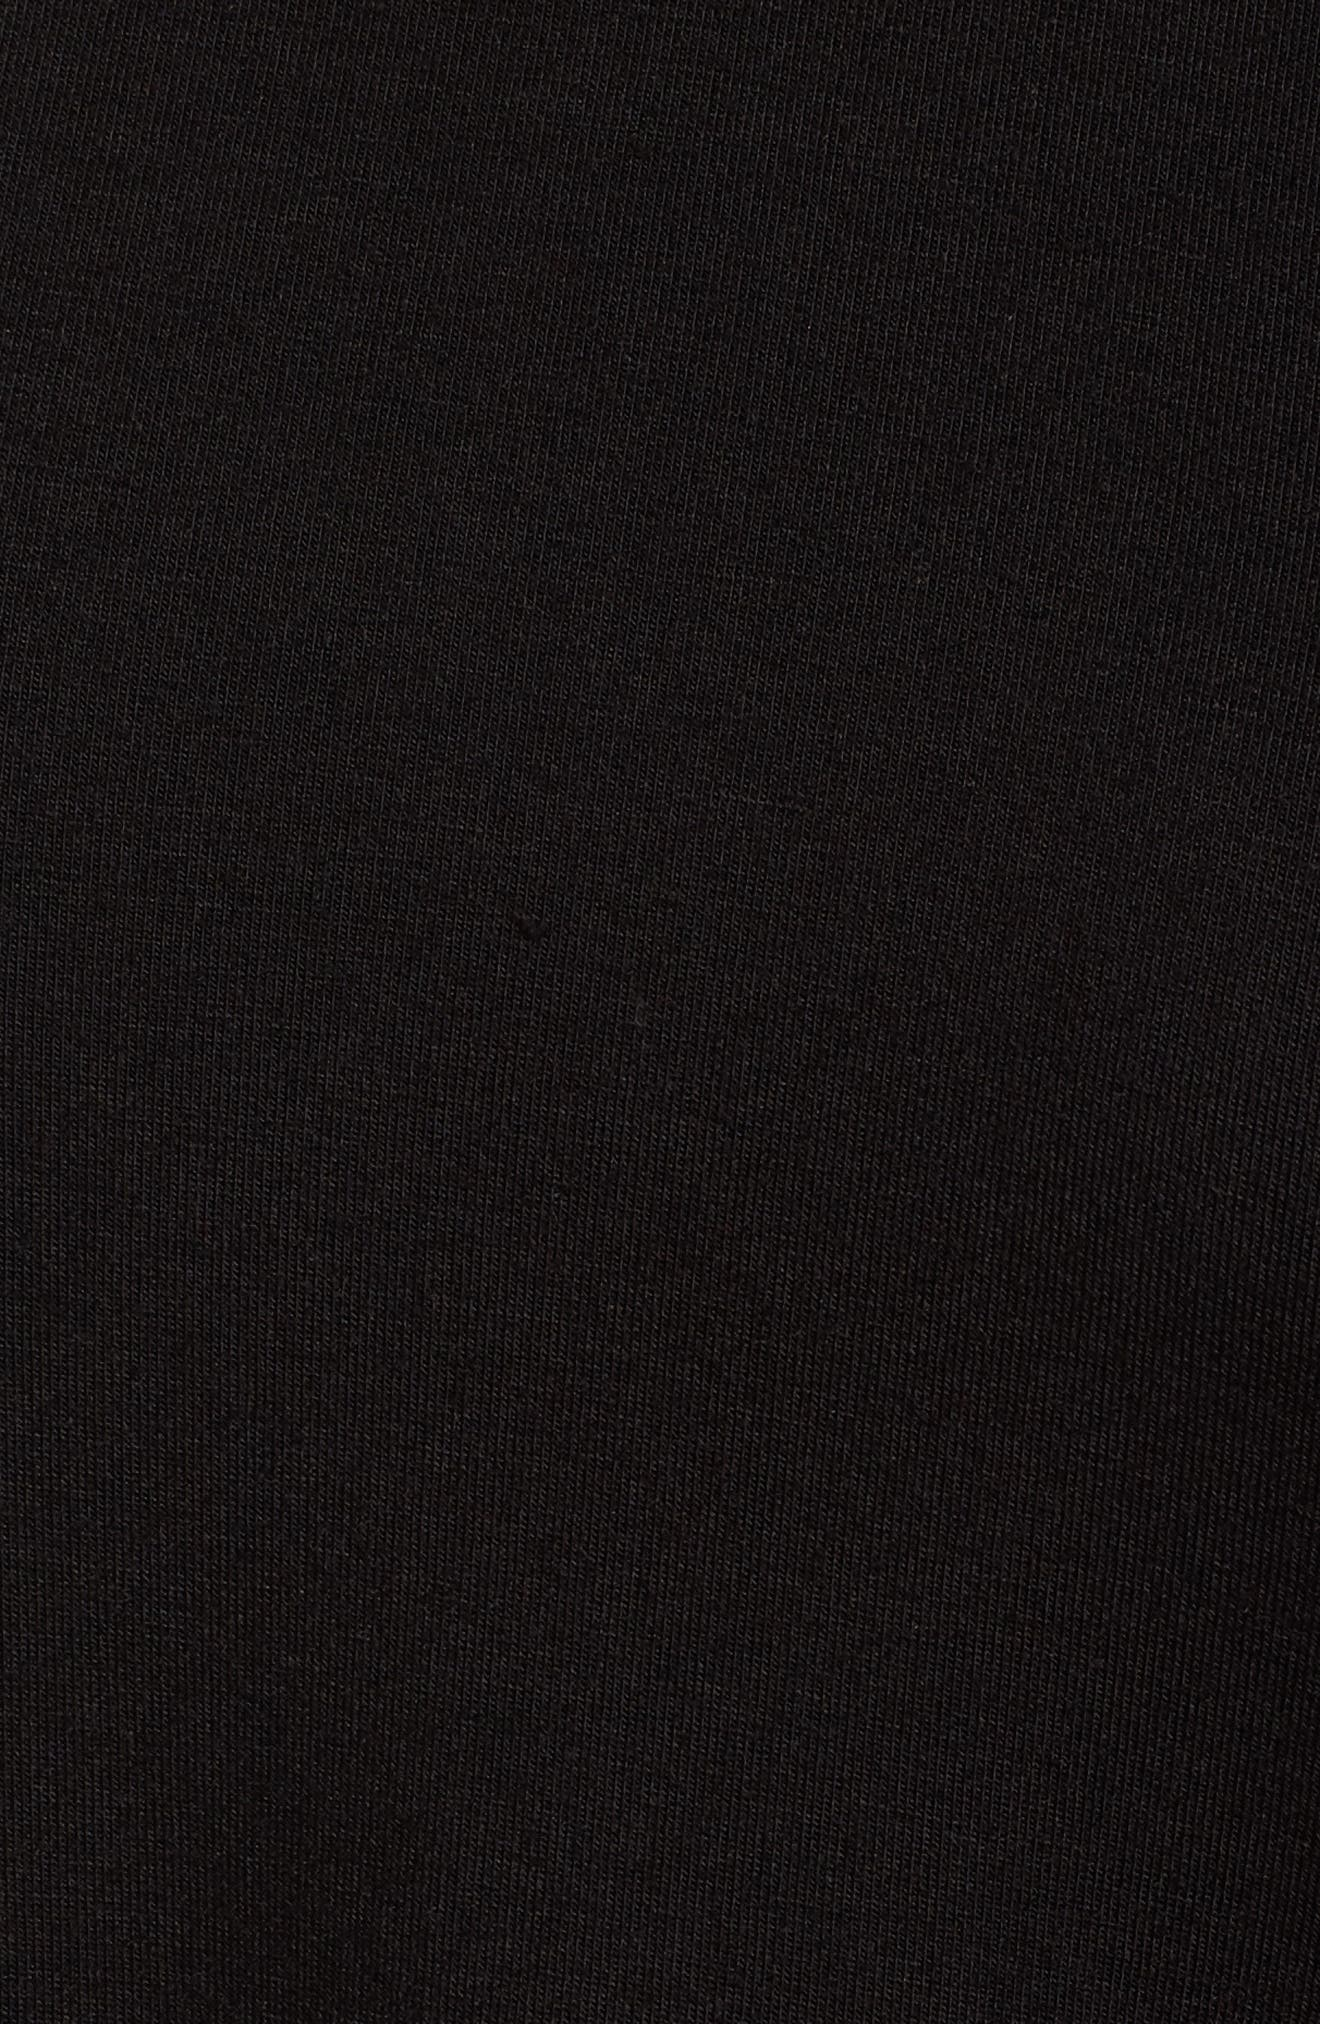 Stretch Cotton Peplum Top,                             Alternate thumbnail 5, color,                             Black